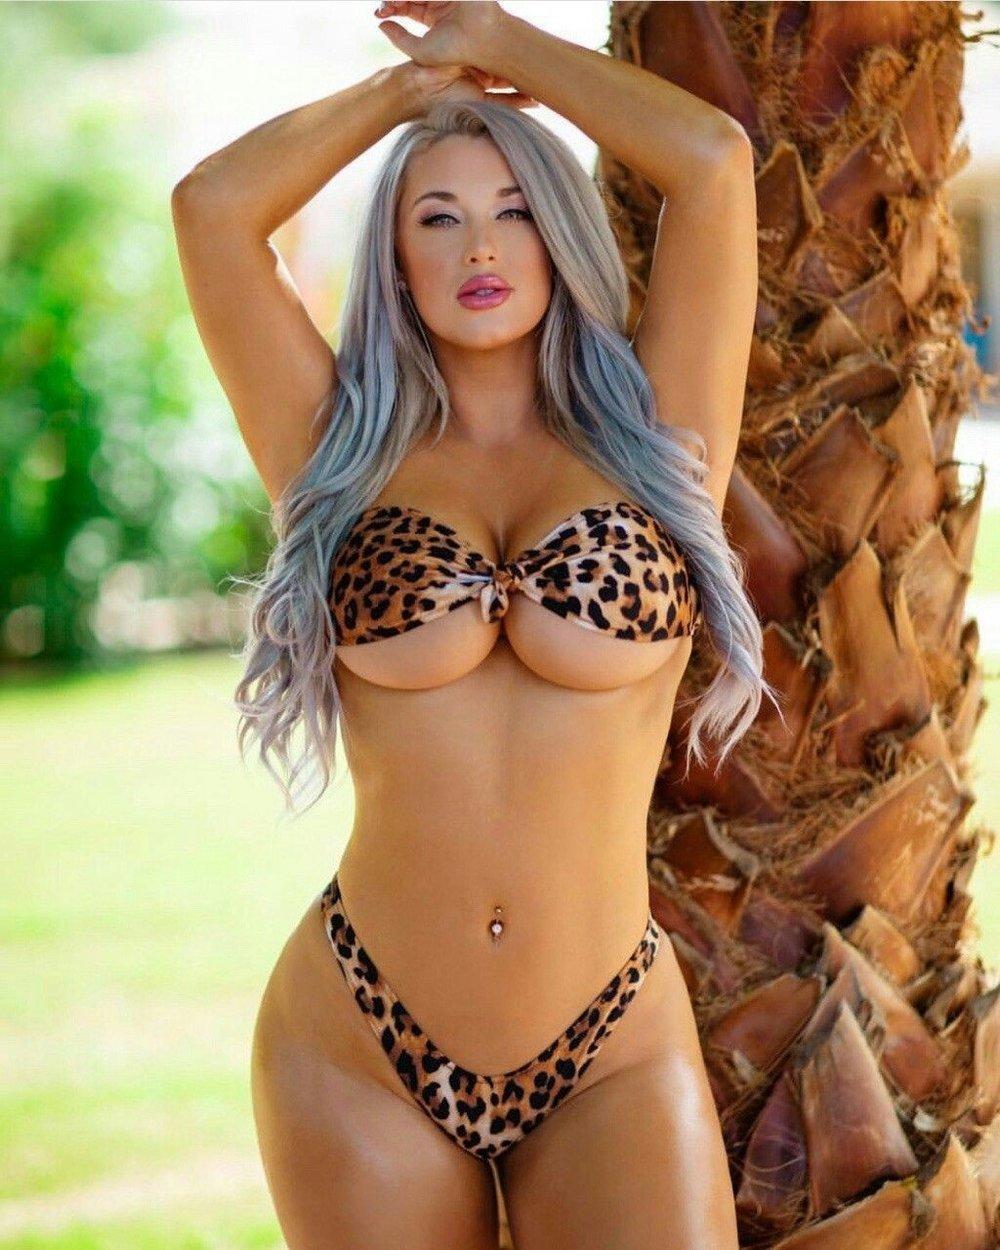 bikini_model_portrait_photography_36.jpg